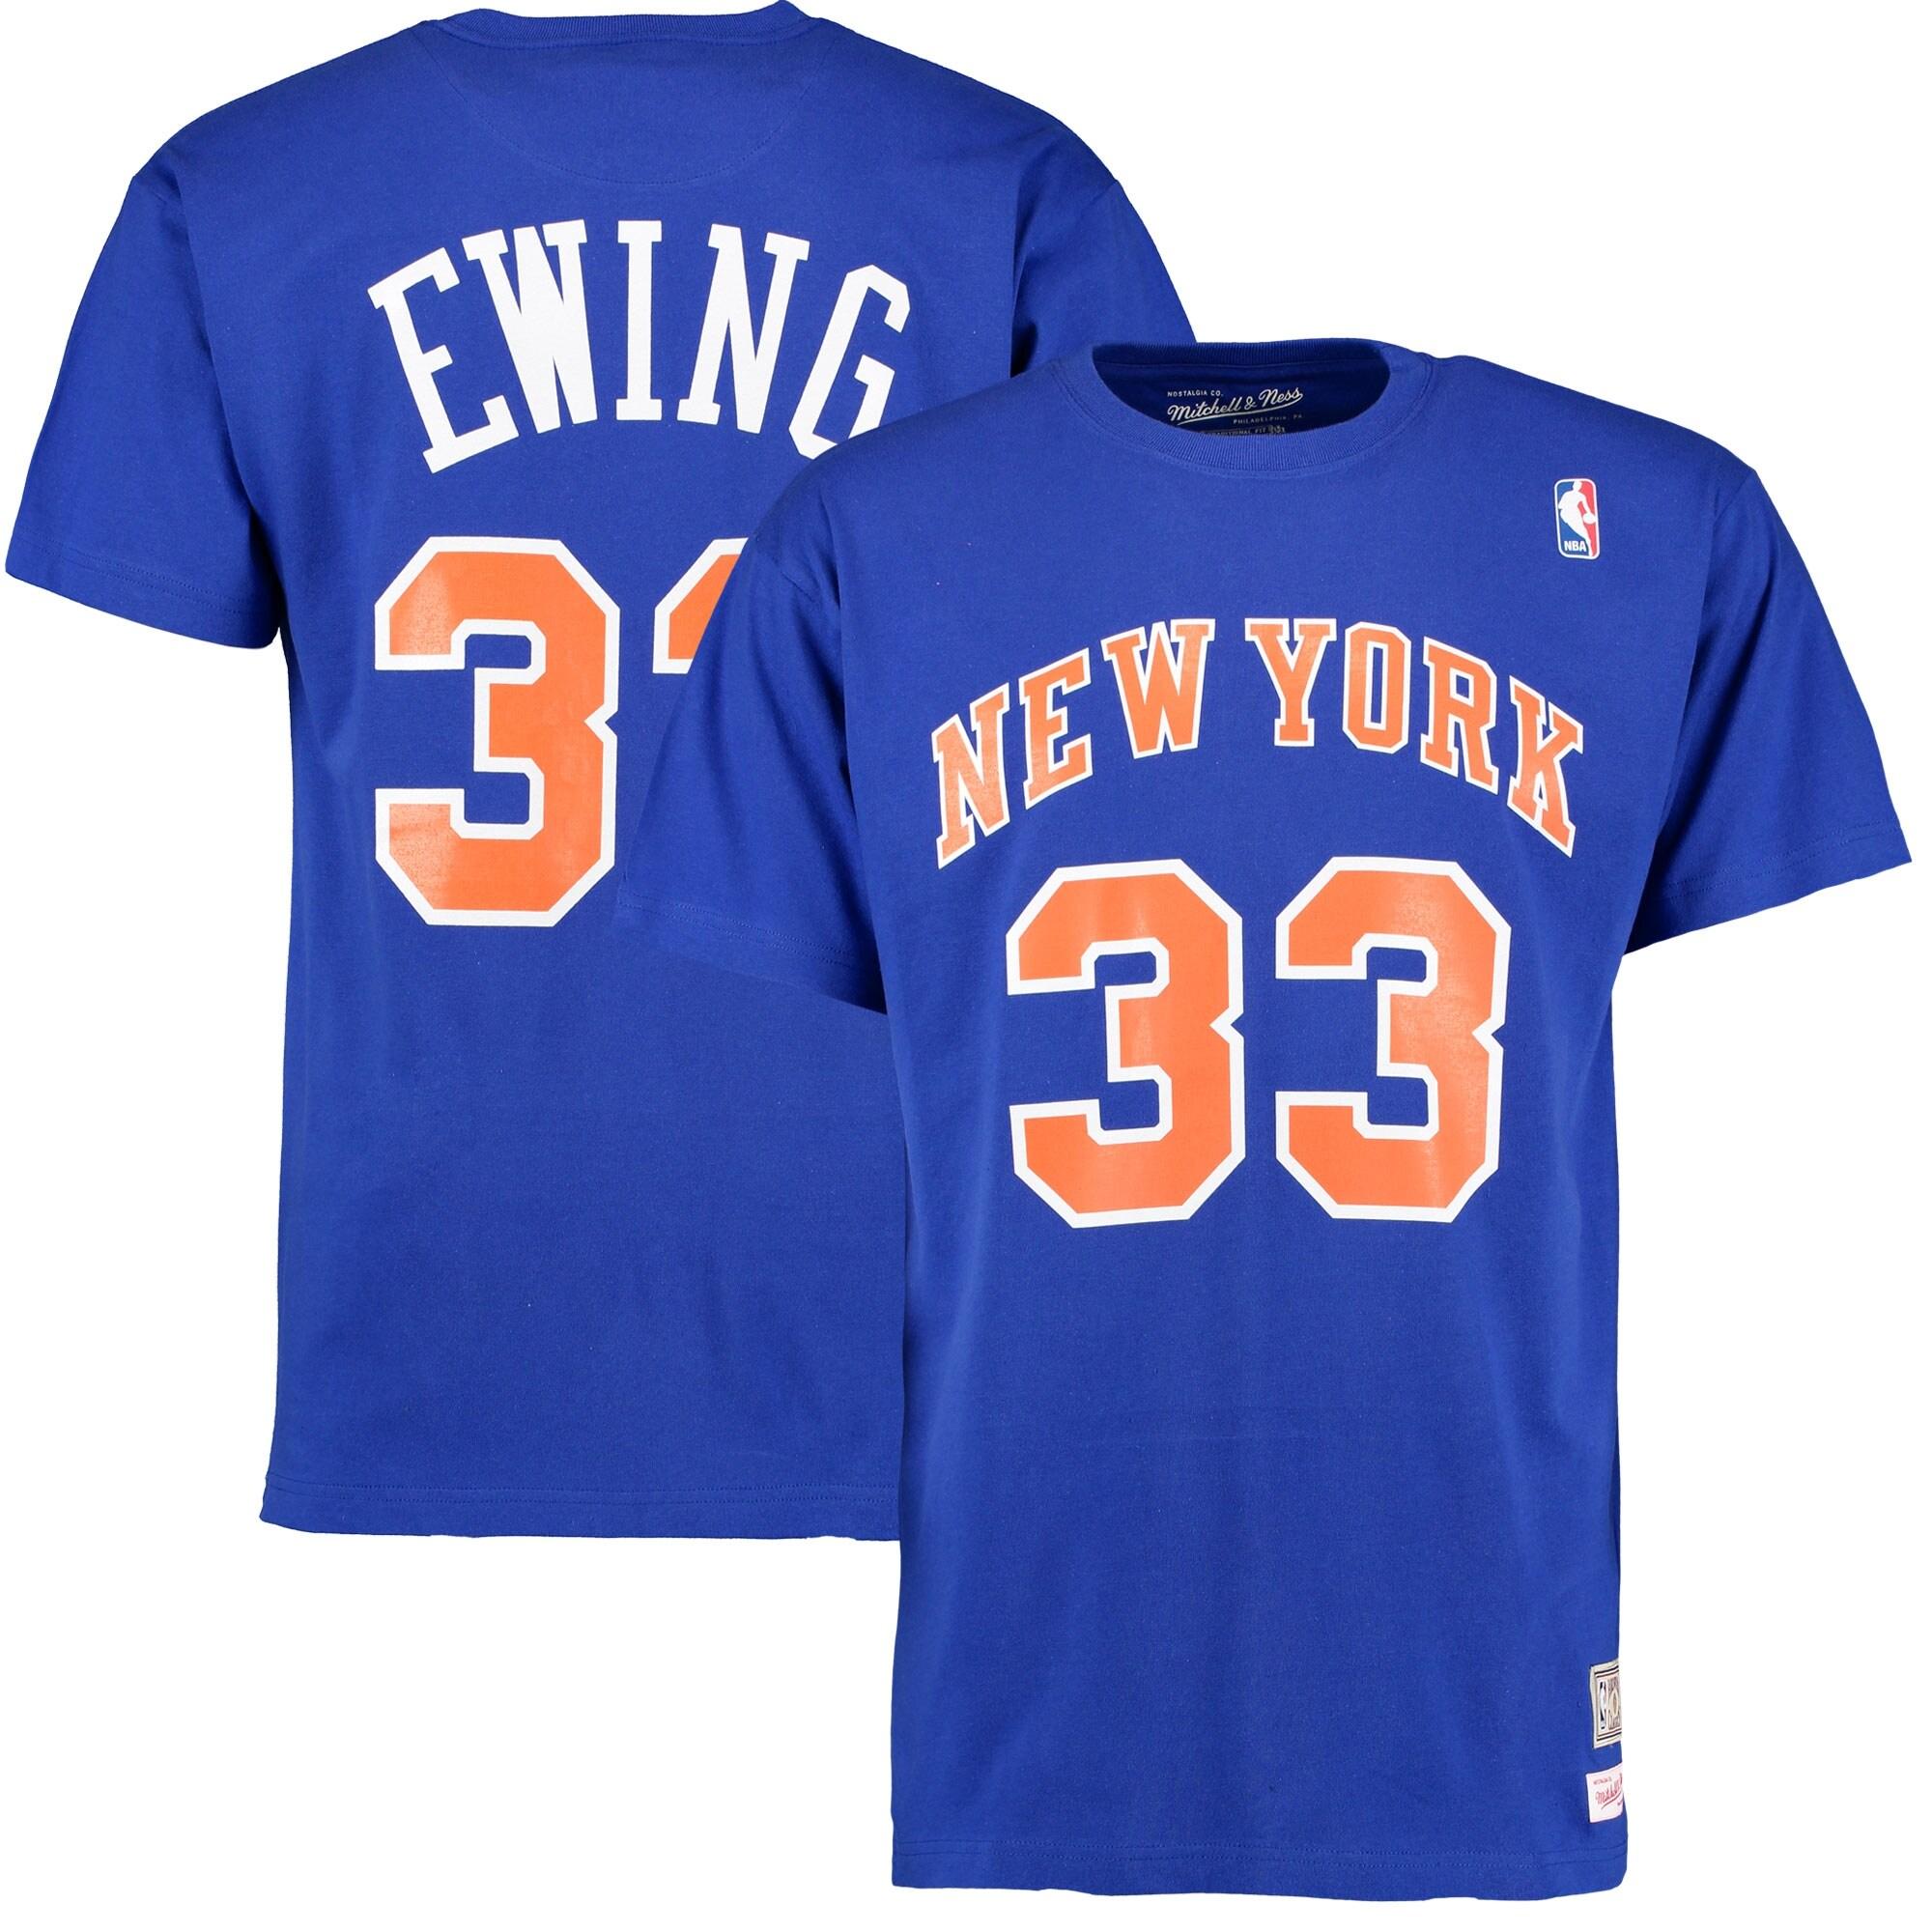 Patrick Ewing New York Knicks Mitchell & Ness Hardwood Classics Name & Number T-Shirt - Royal